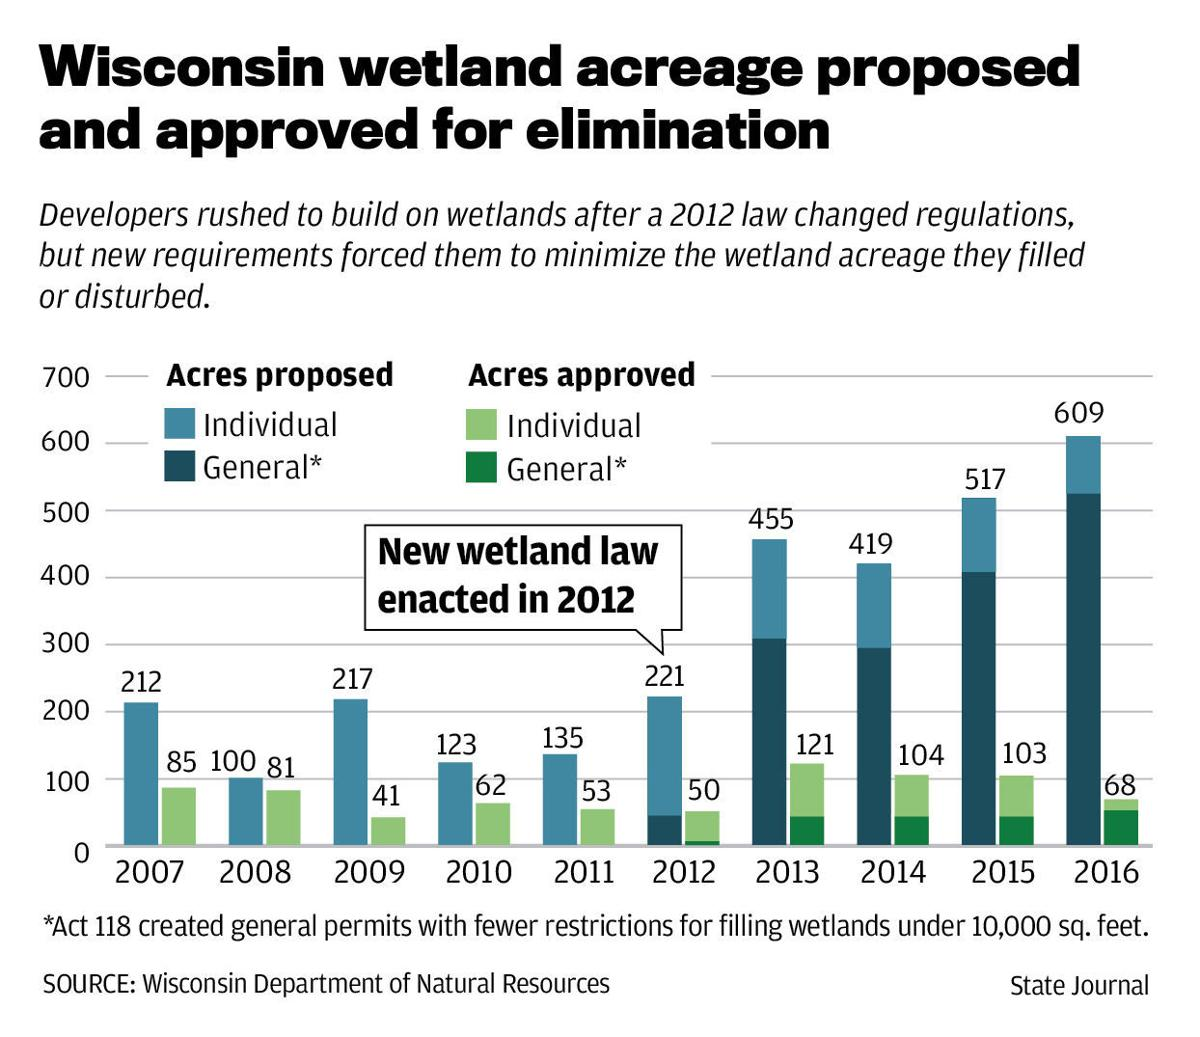 Permits to fill Wisconsin wetland acreage